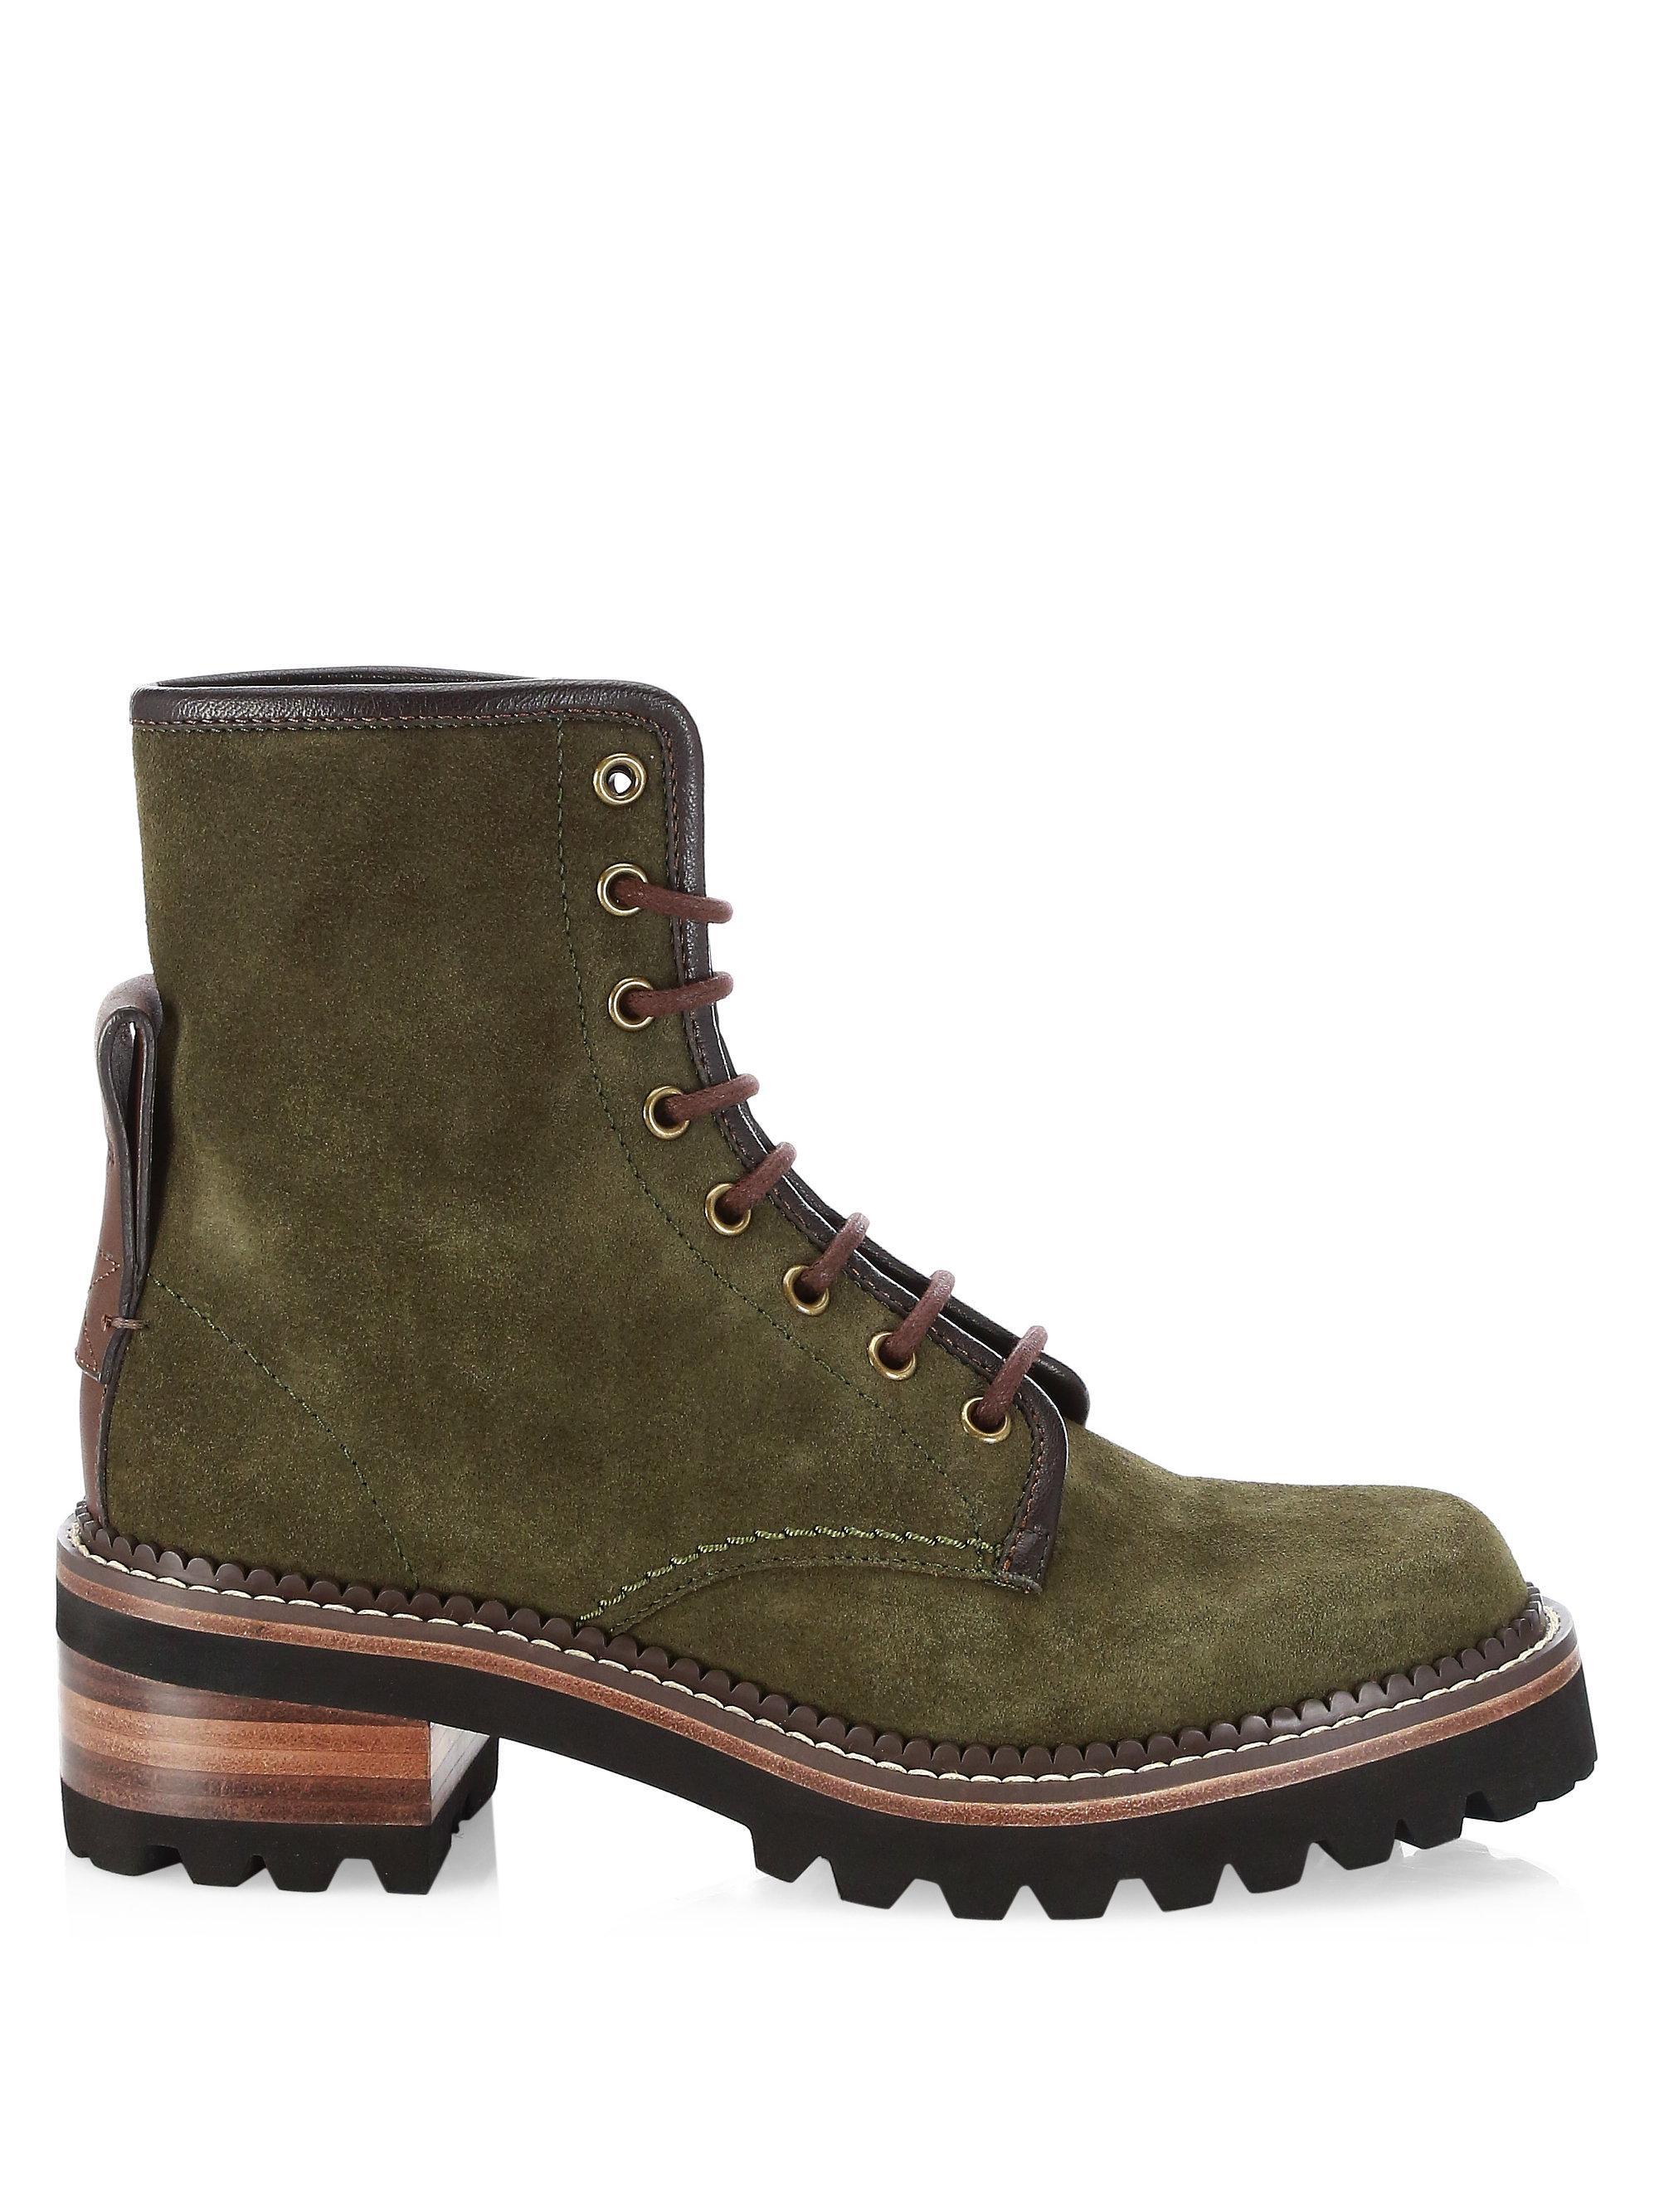 Chloé Marta Lace-Up Boots UlG3wf3Aj